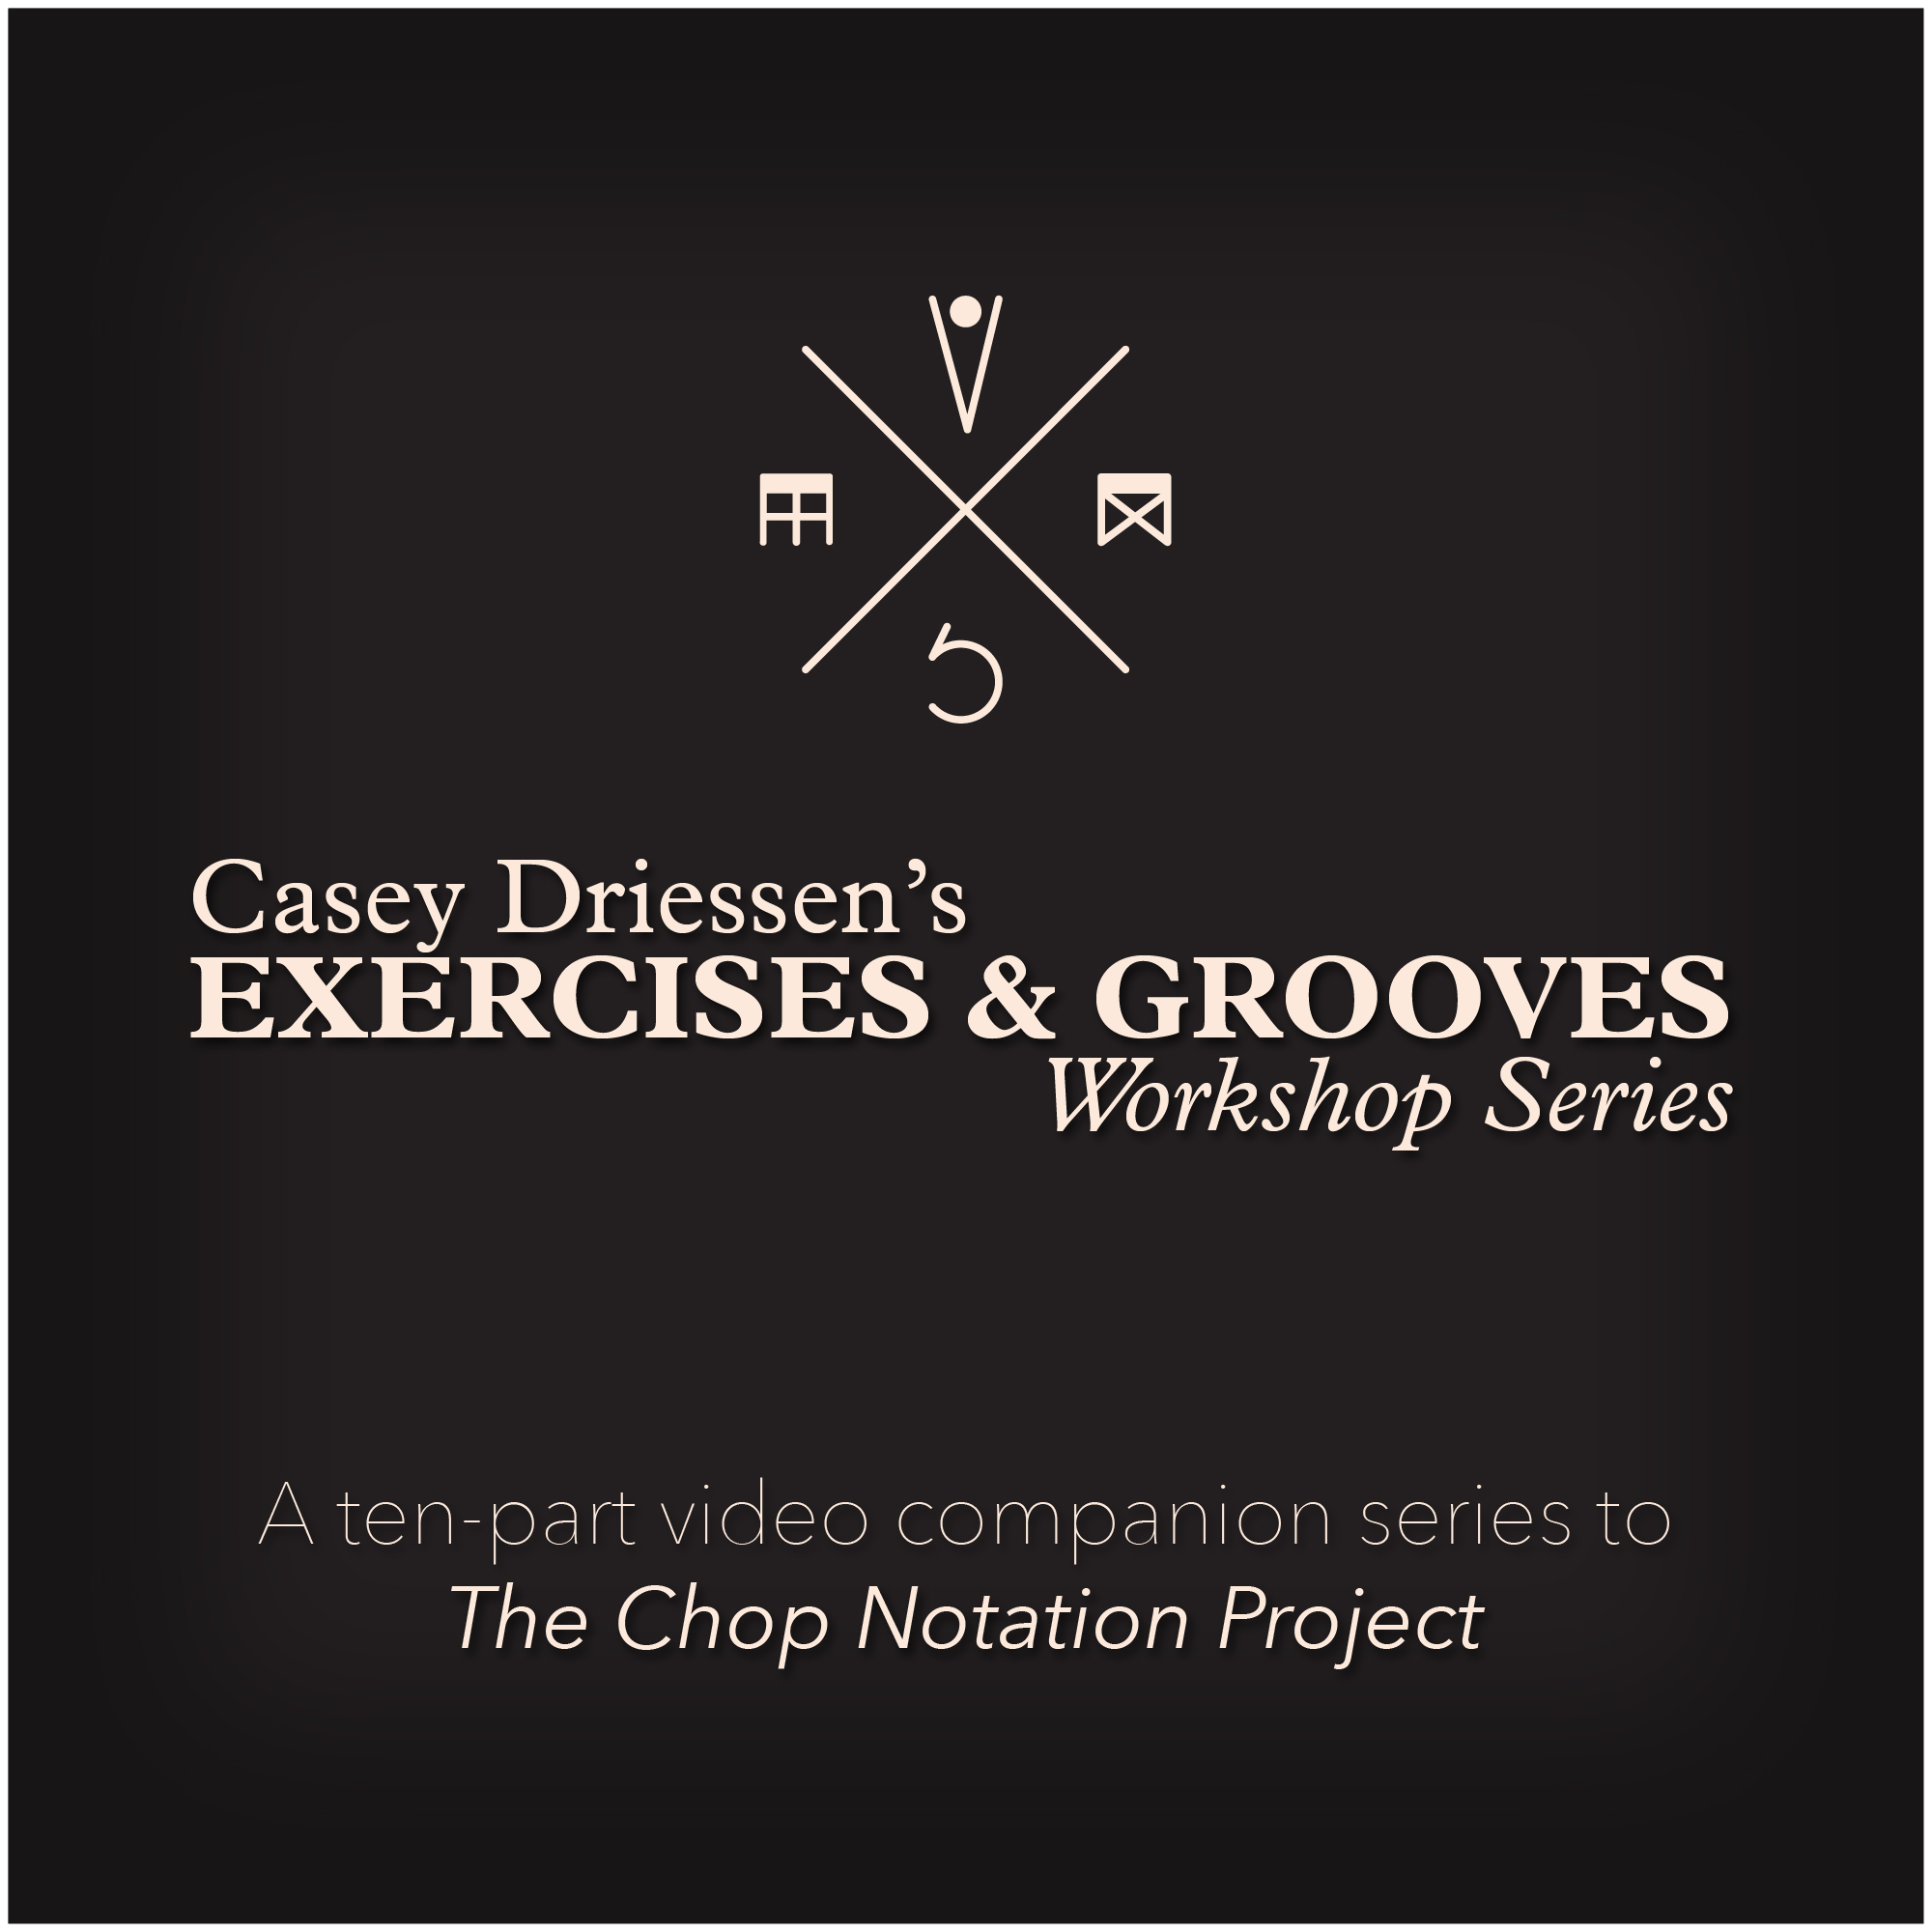 Copy of Exercises & Grooves Workshop Series (10 Videos)